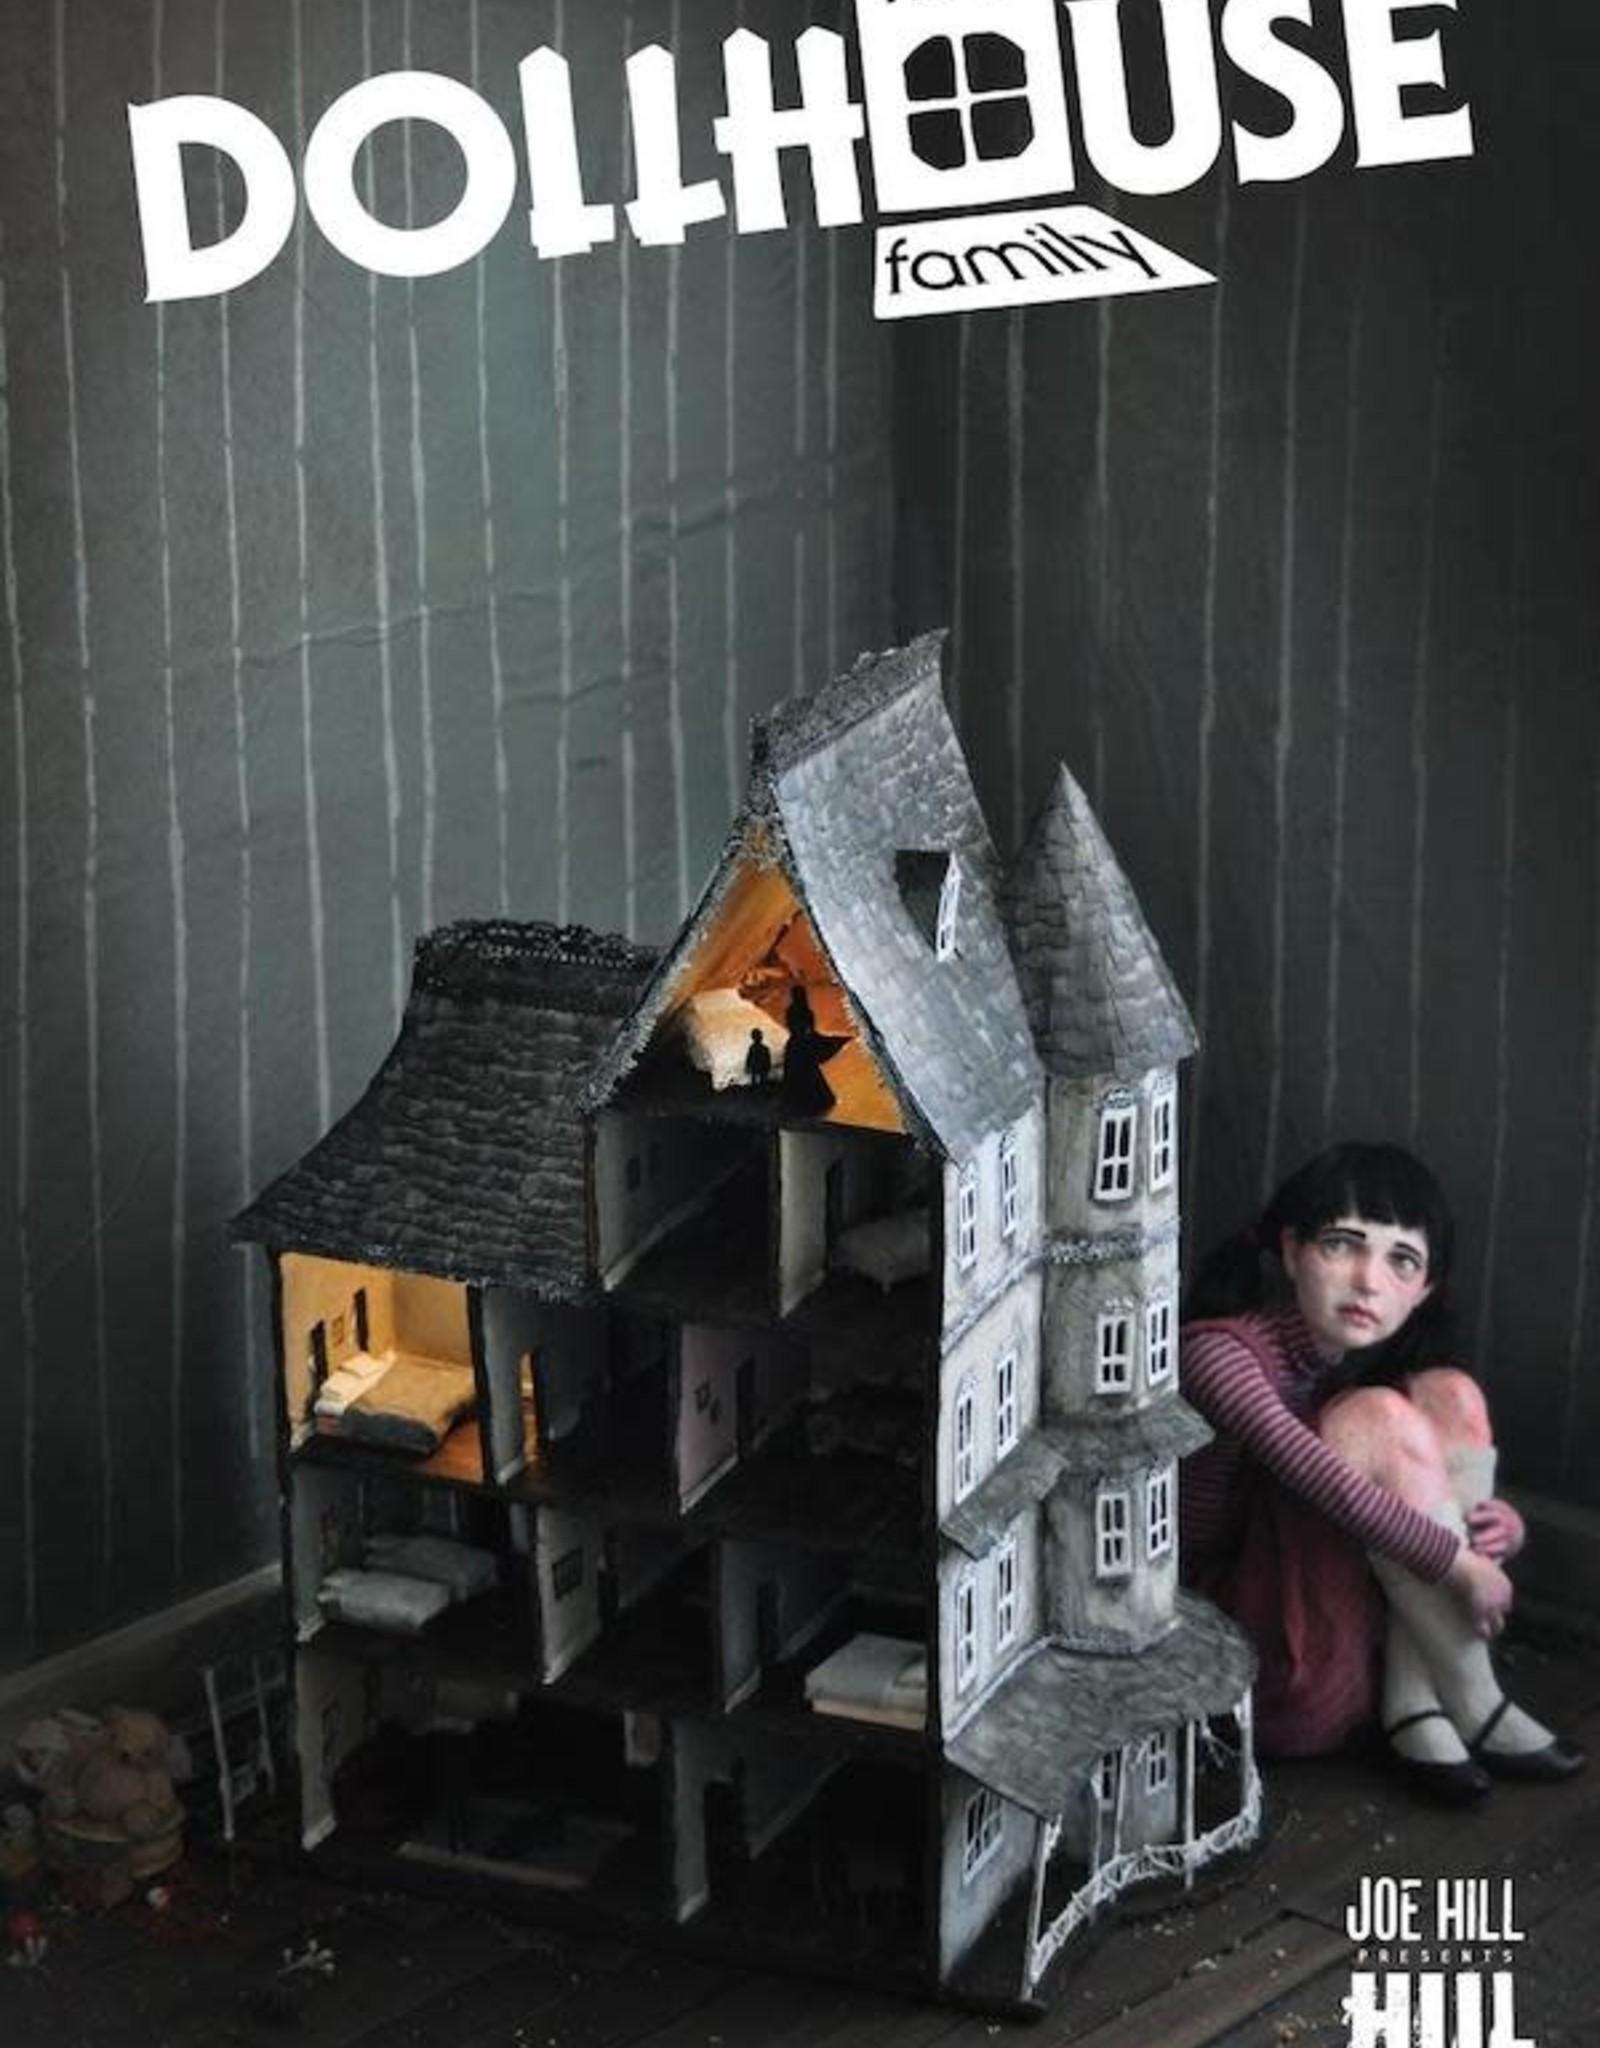 DC Comics Dollhouse Family HC